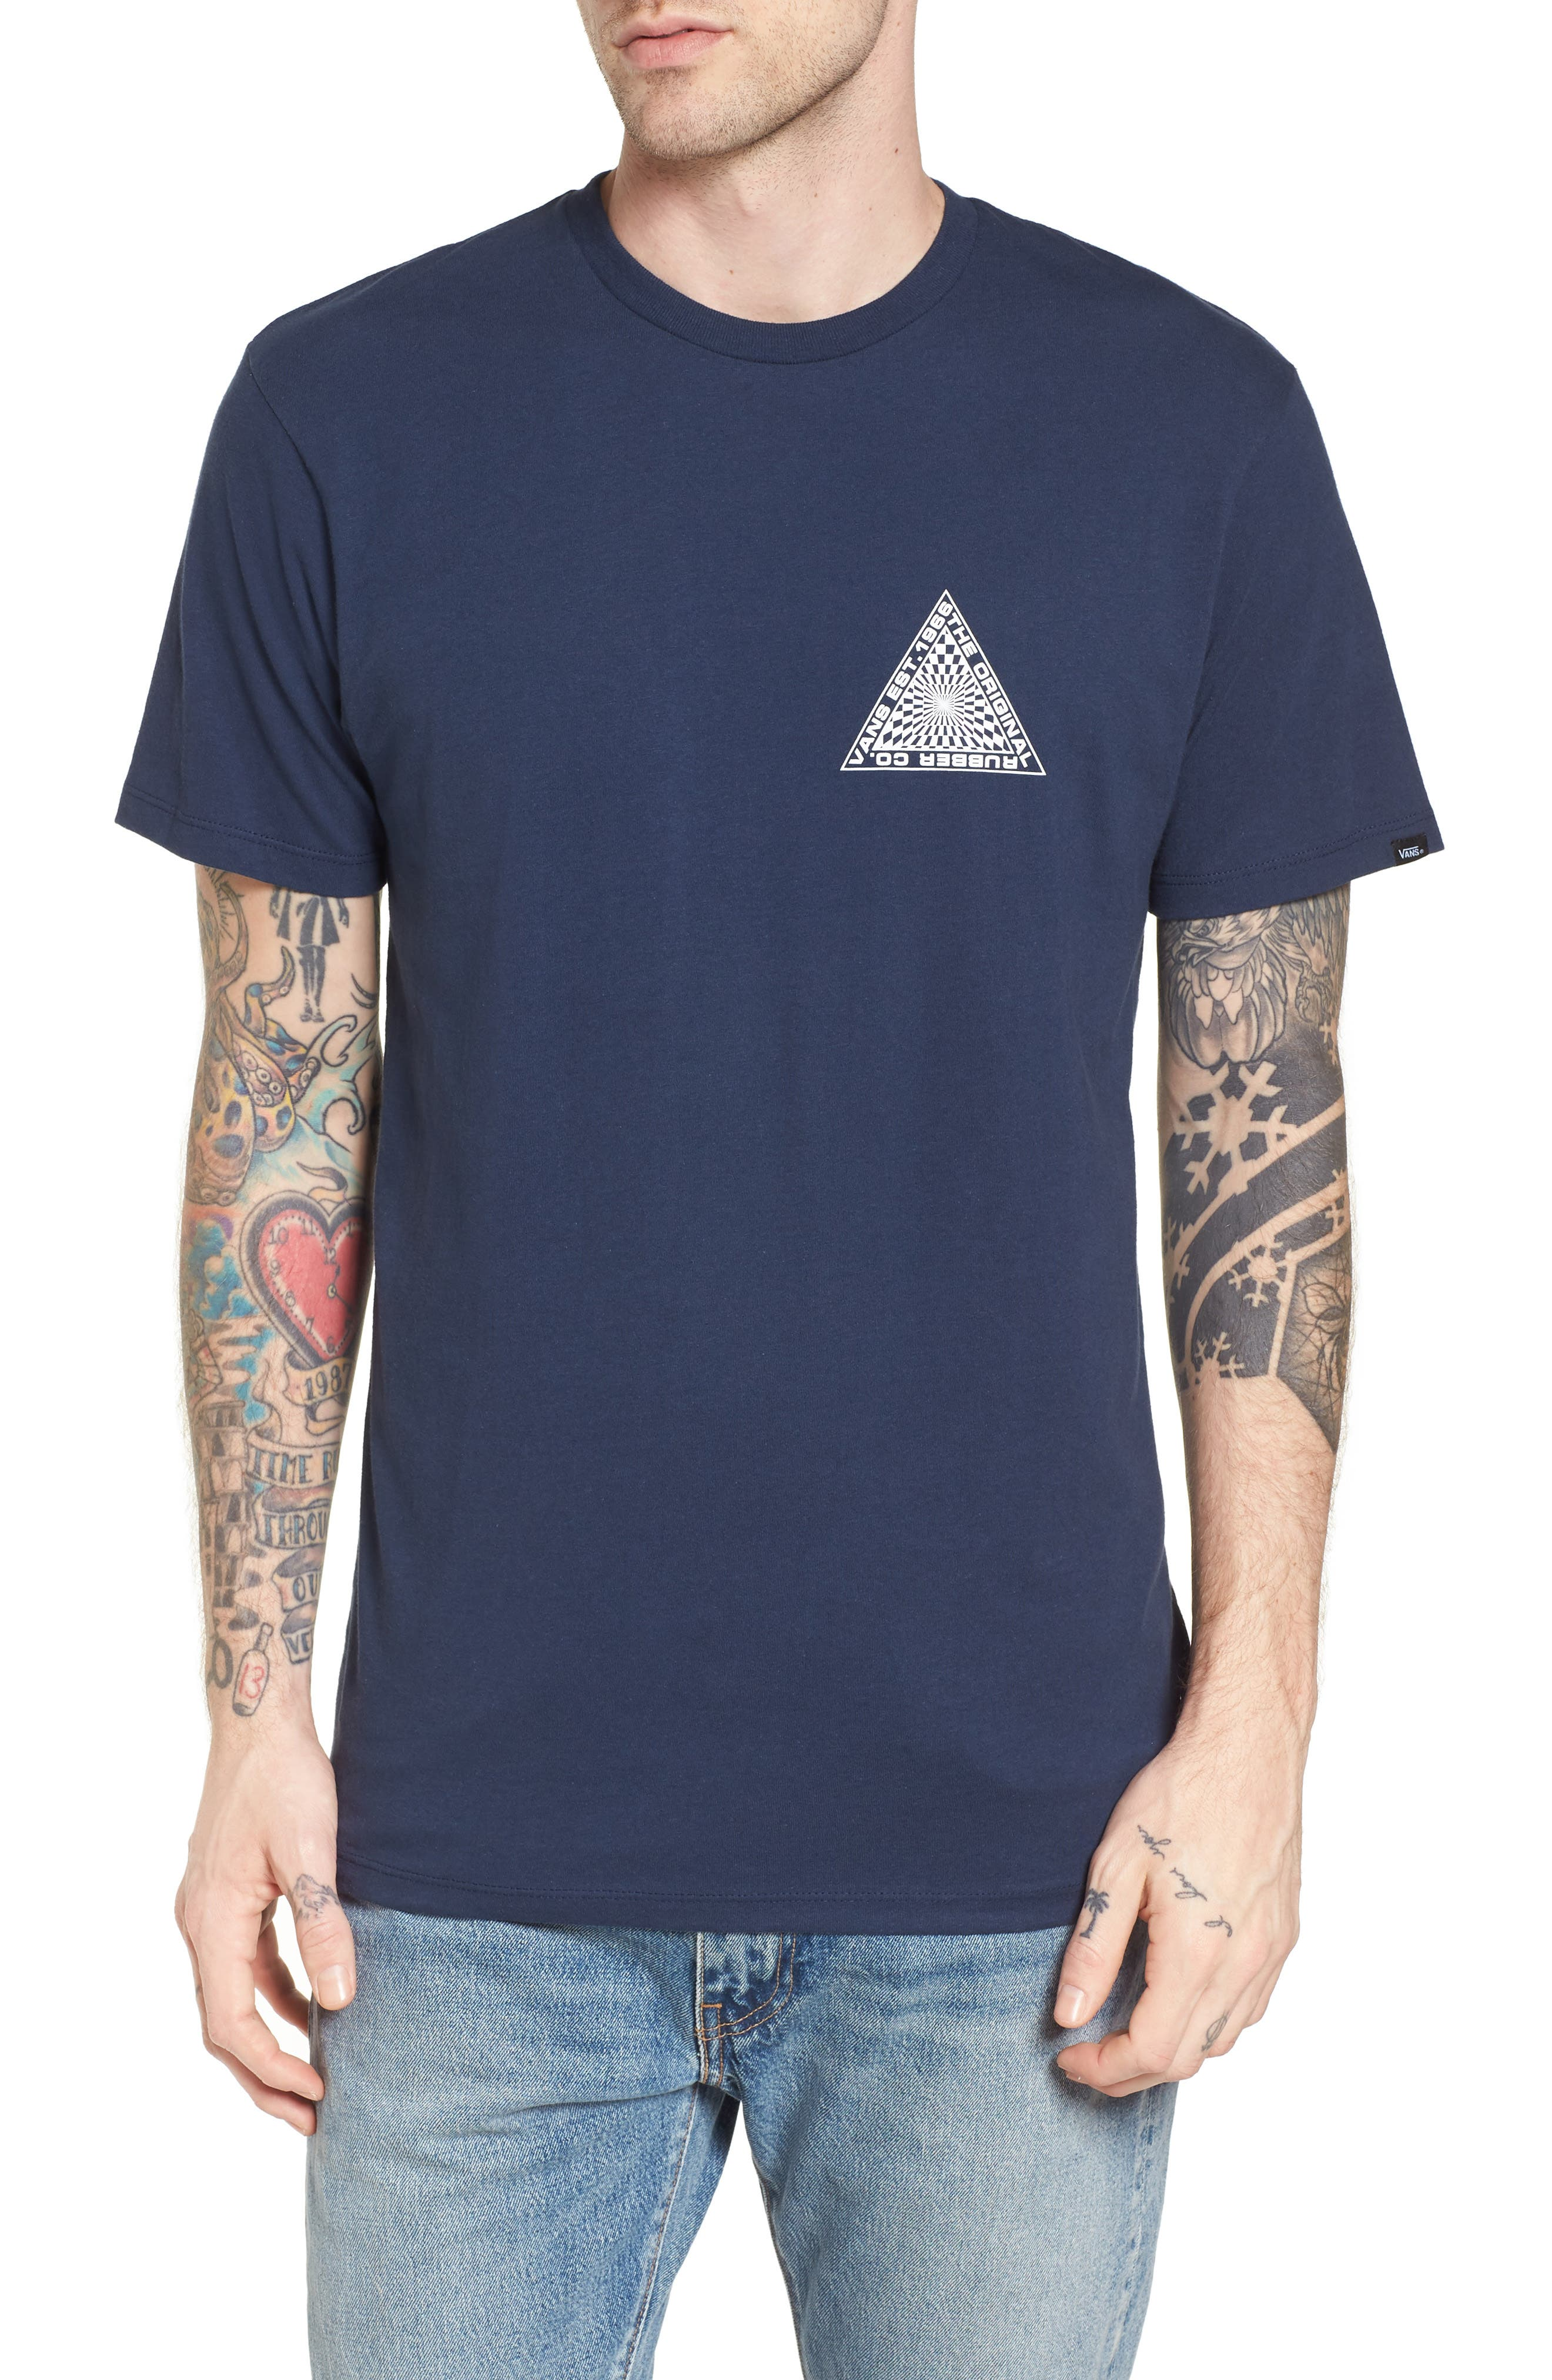 Hypnotics T-Shirt,                             Main thumbnail 1, color,                             Dress Blues